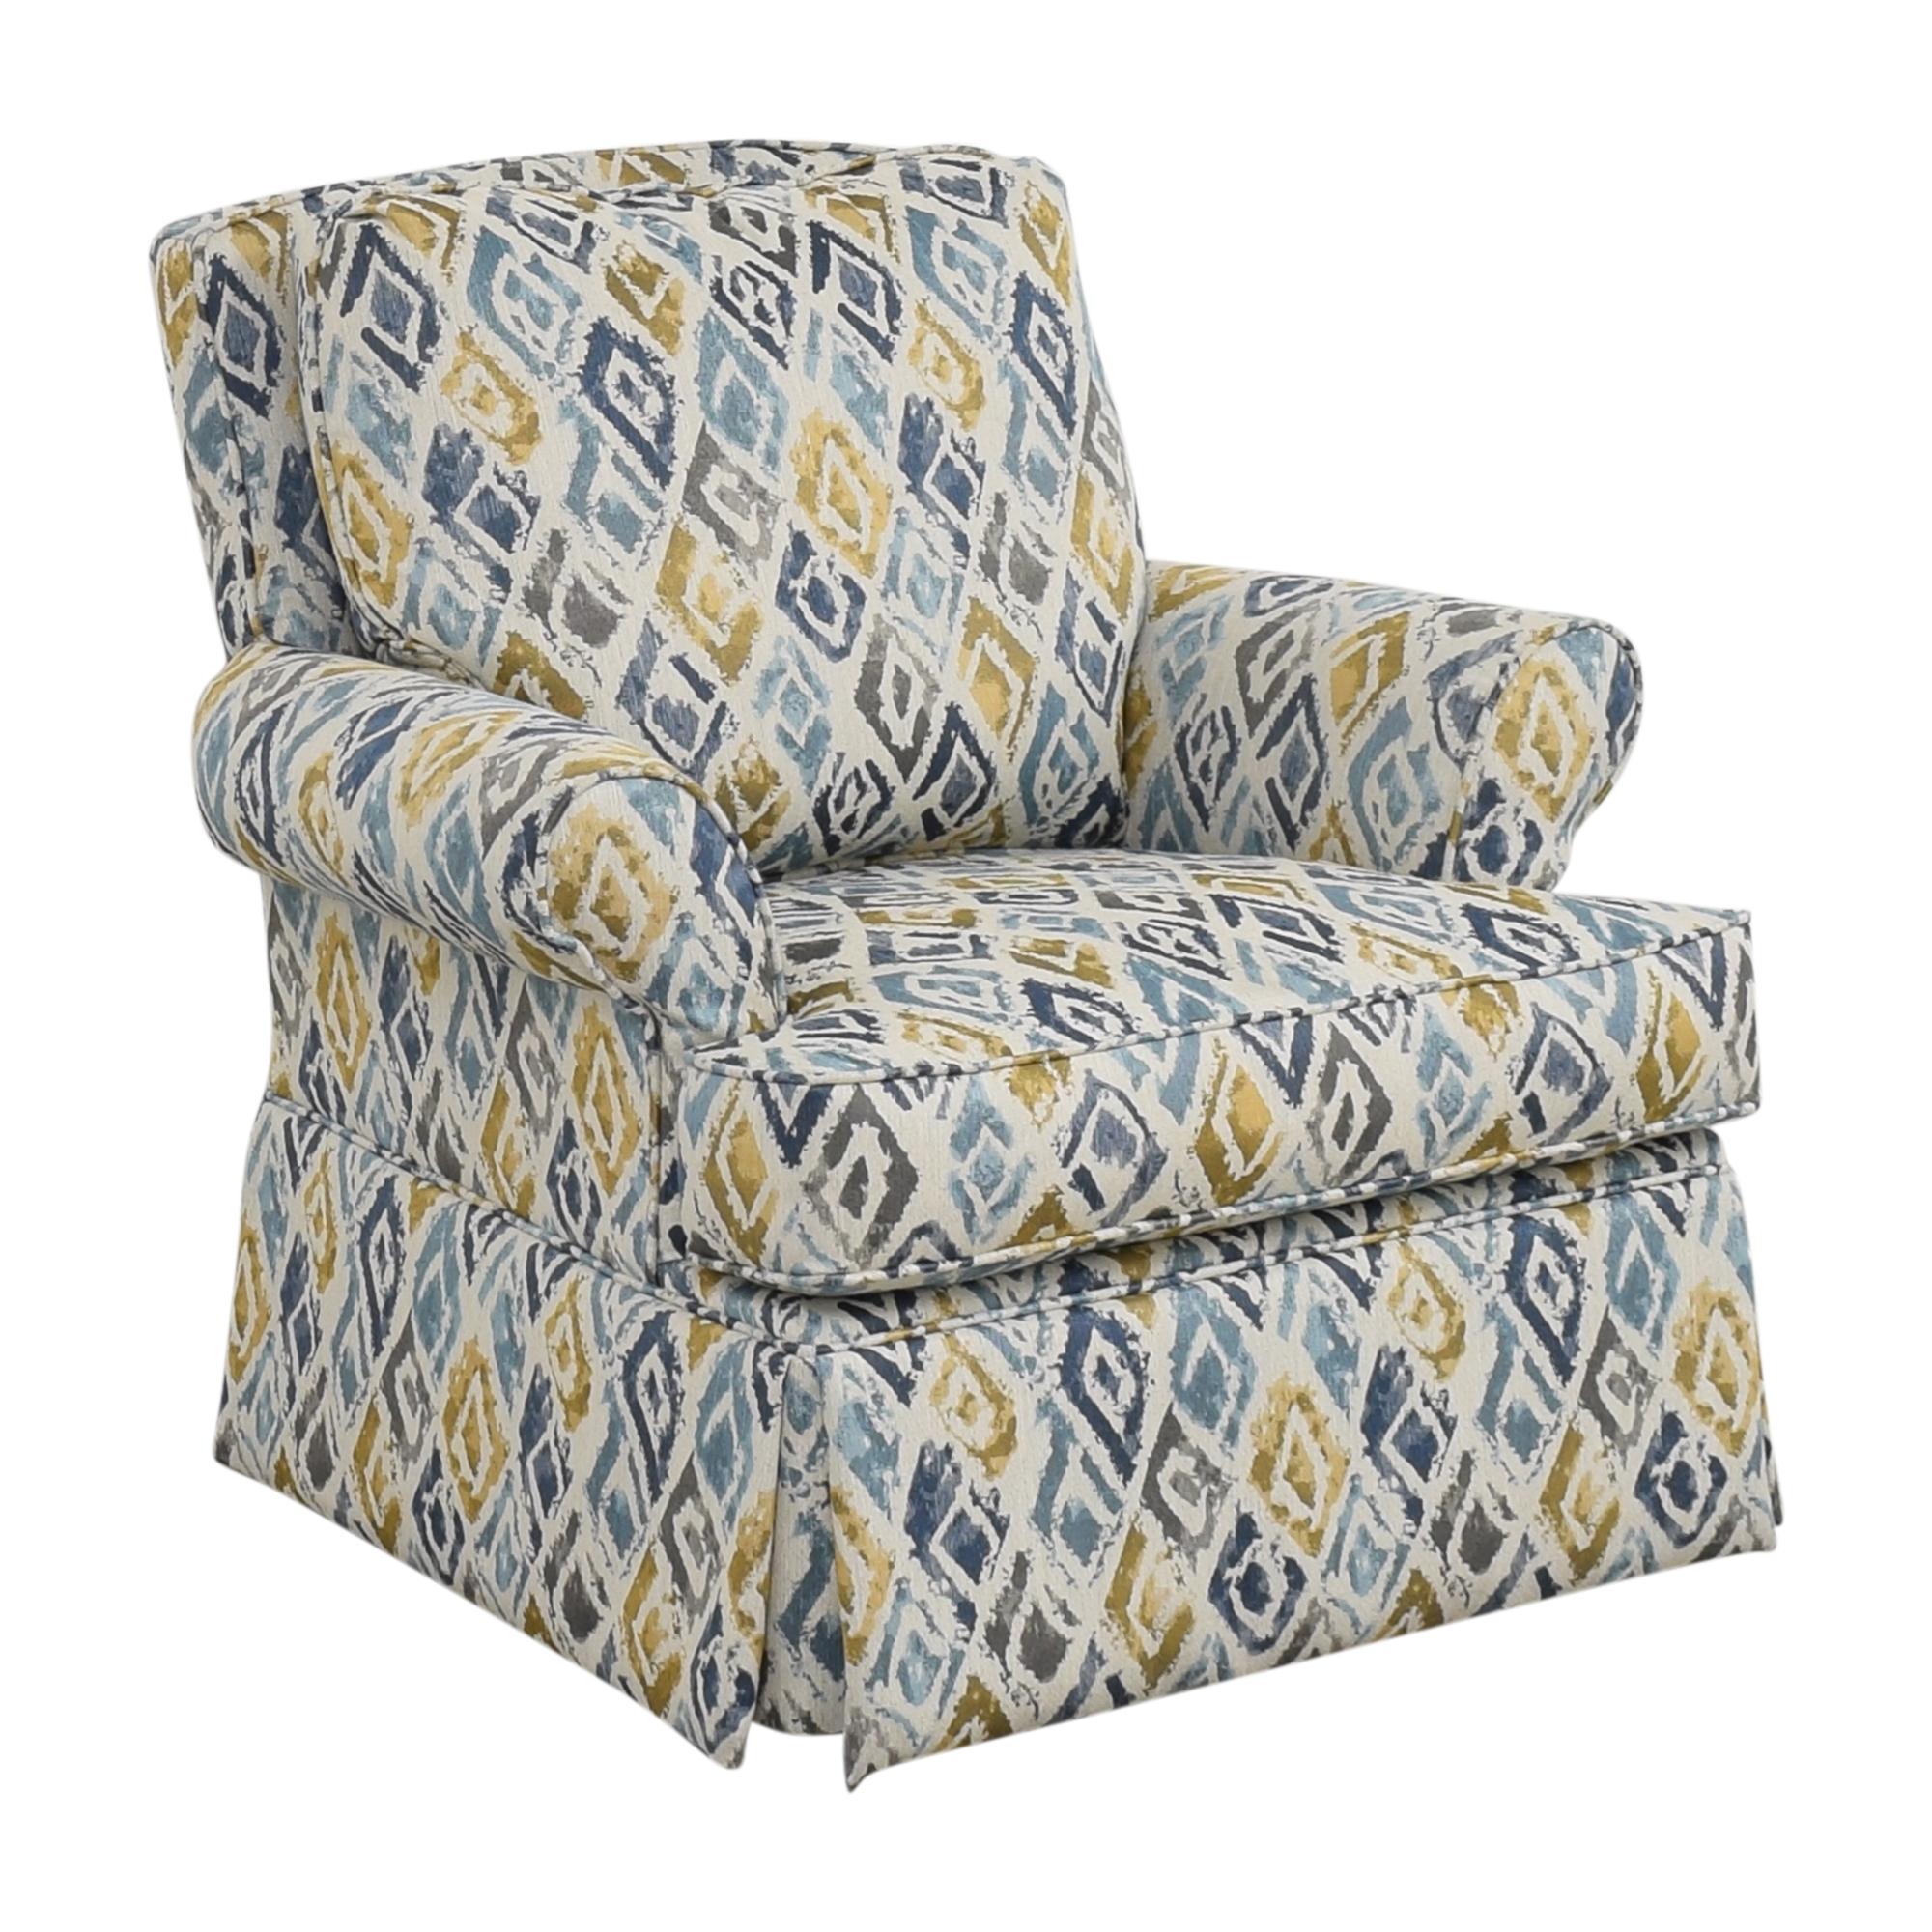 shop Raymour & Flanigan Swivel Accent Chair Raymour & Flanigan